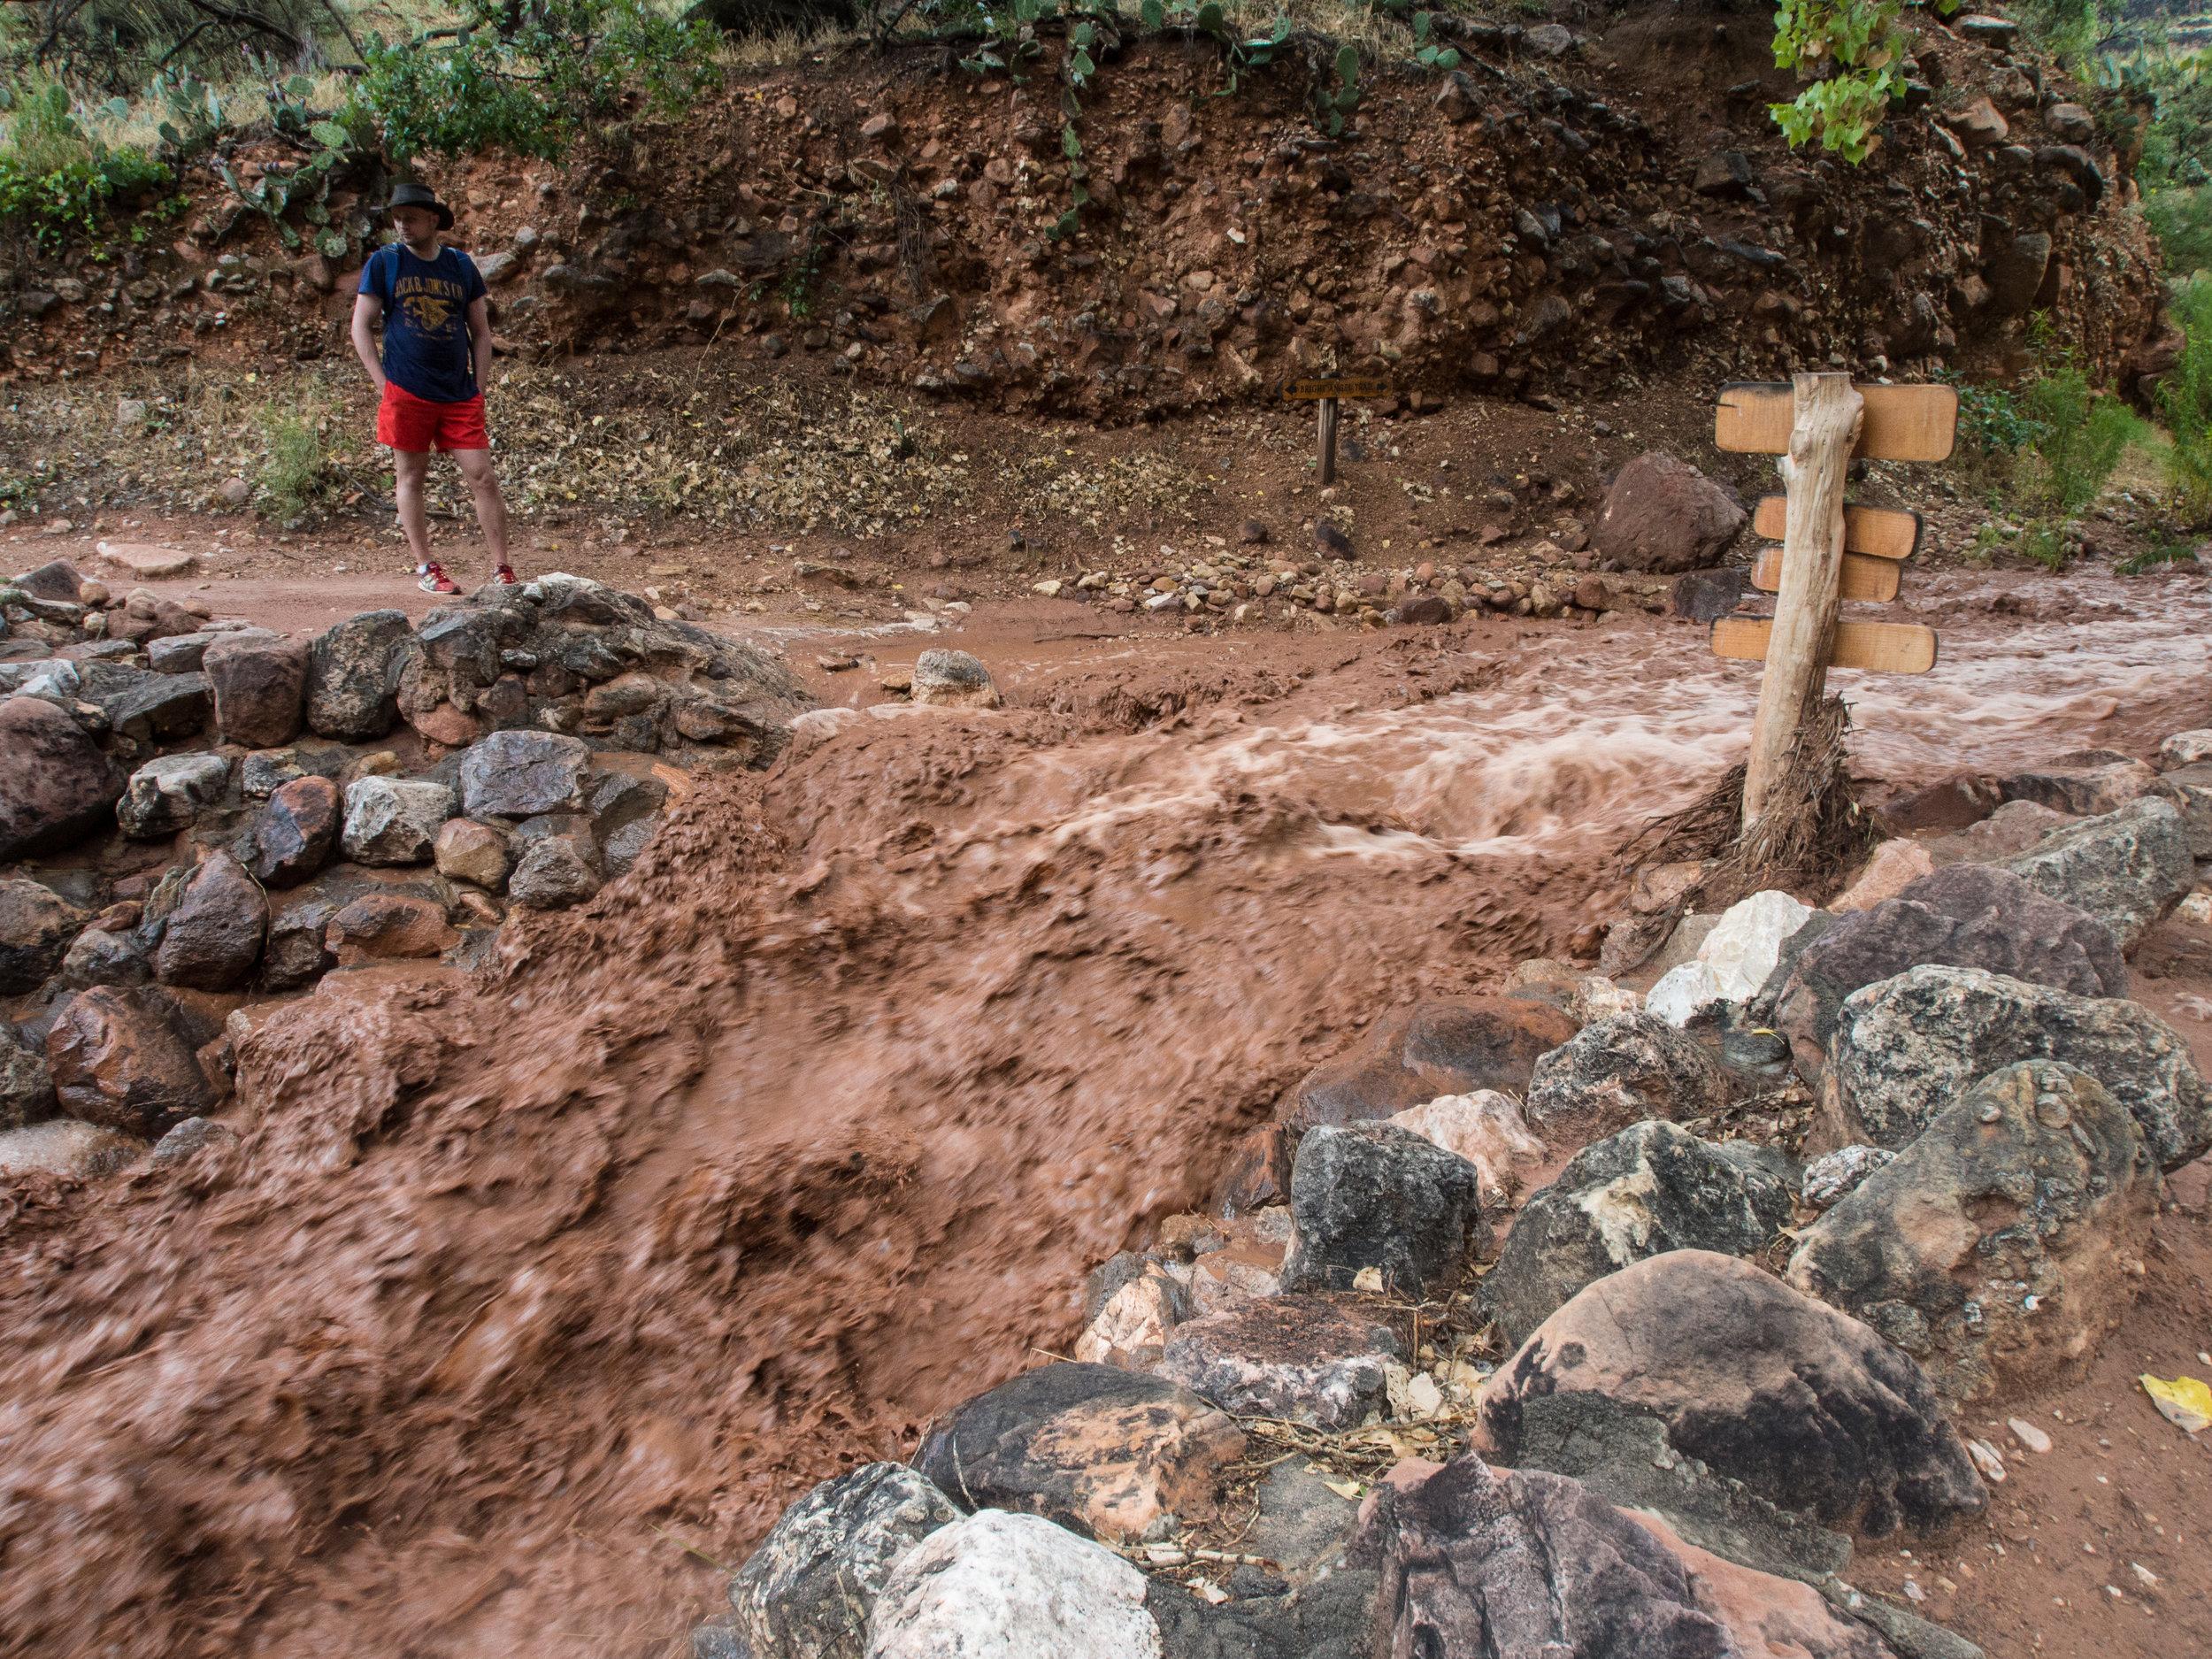 Flash flood passing through Indian Garden